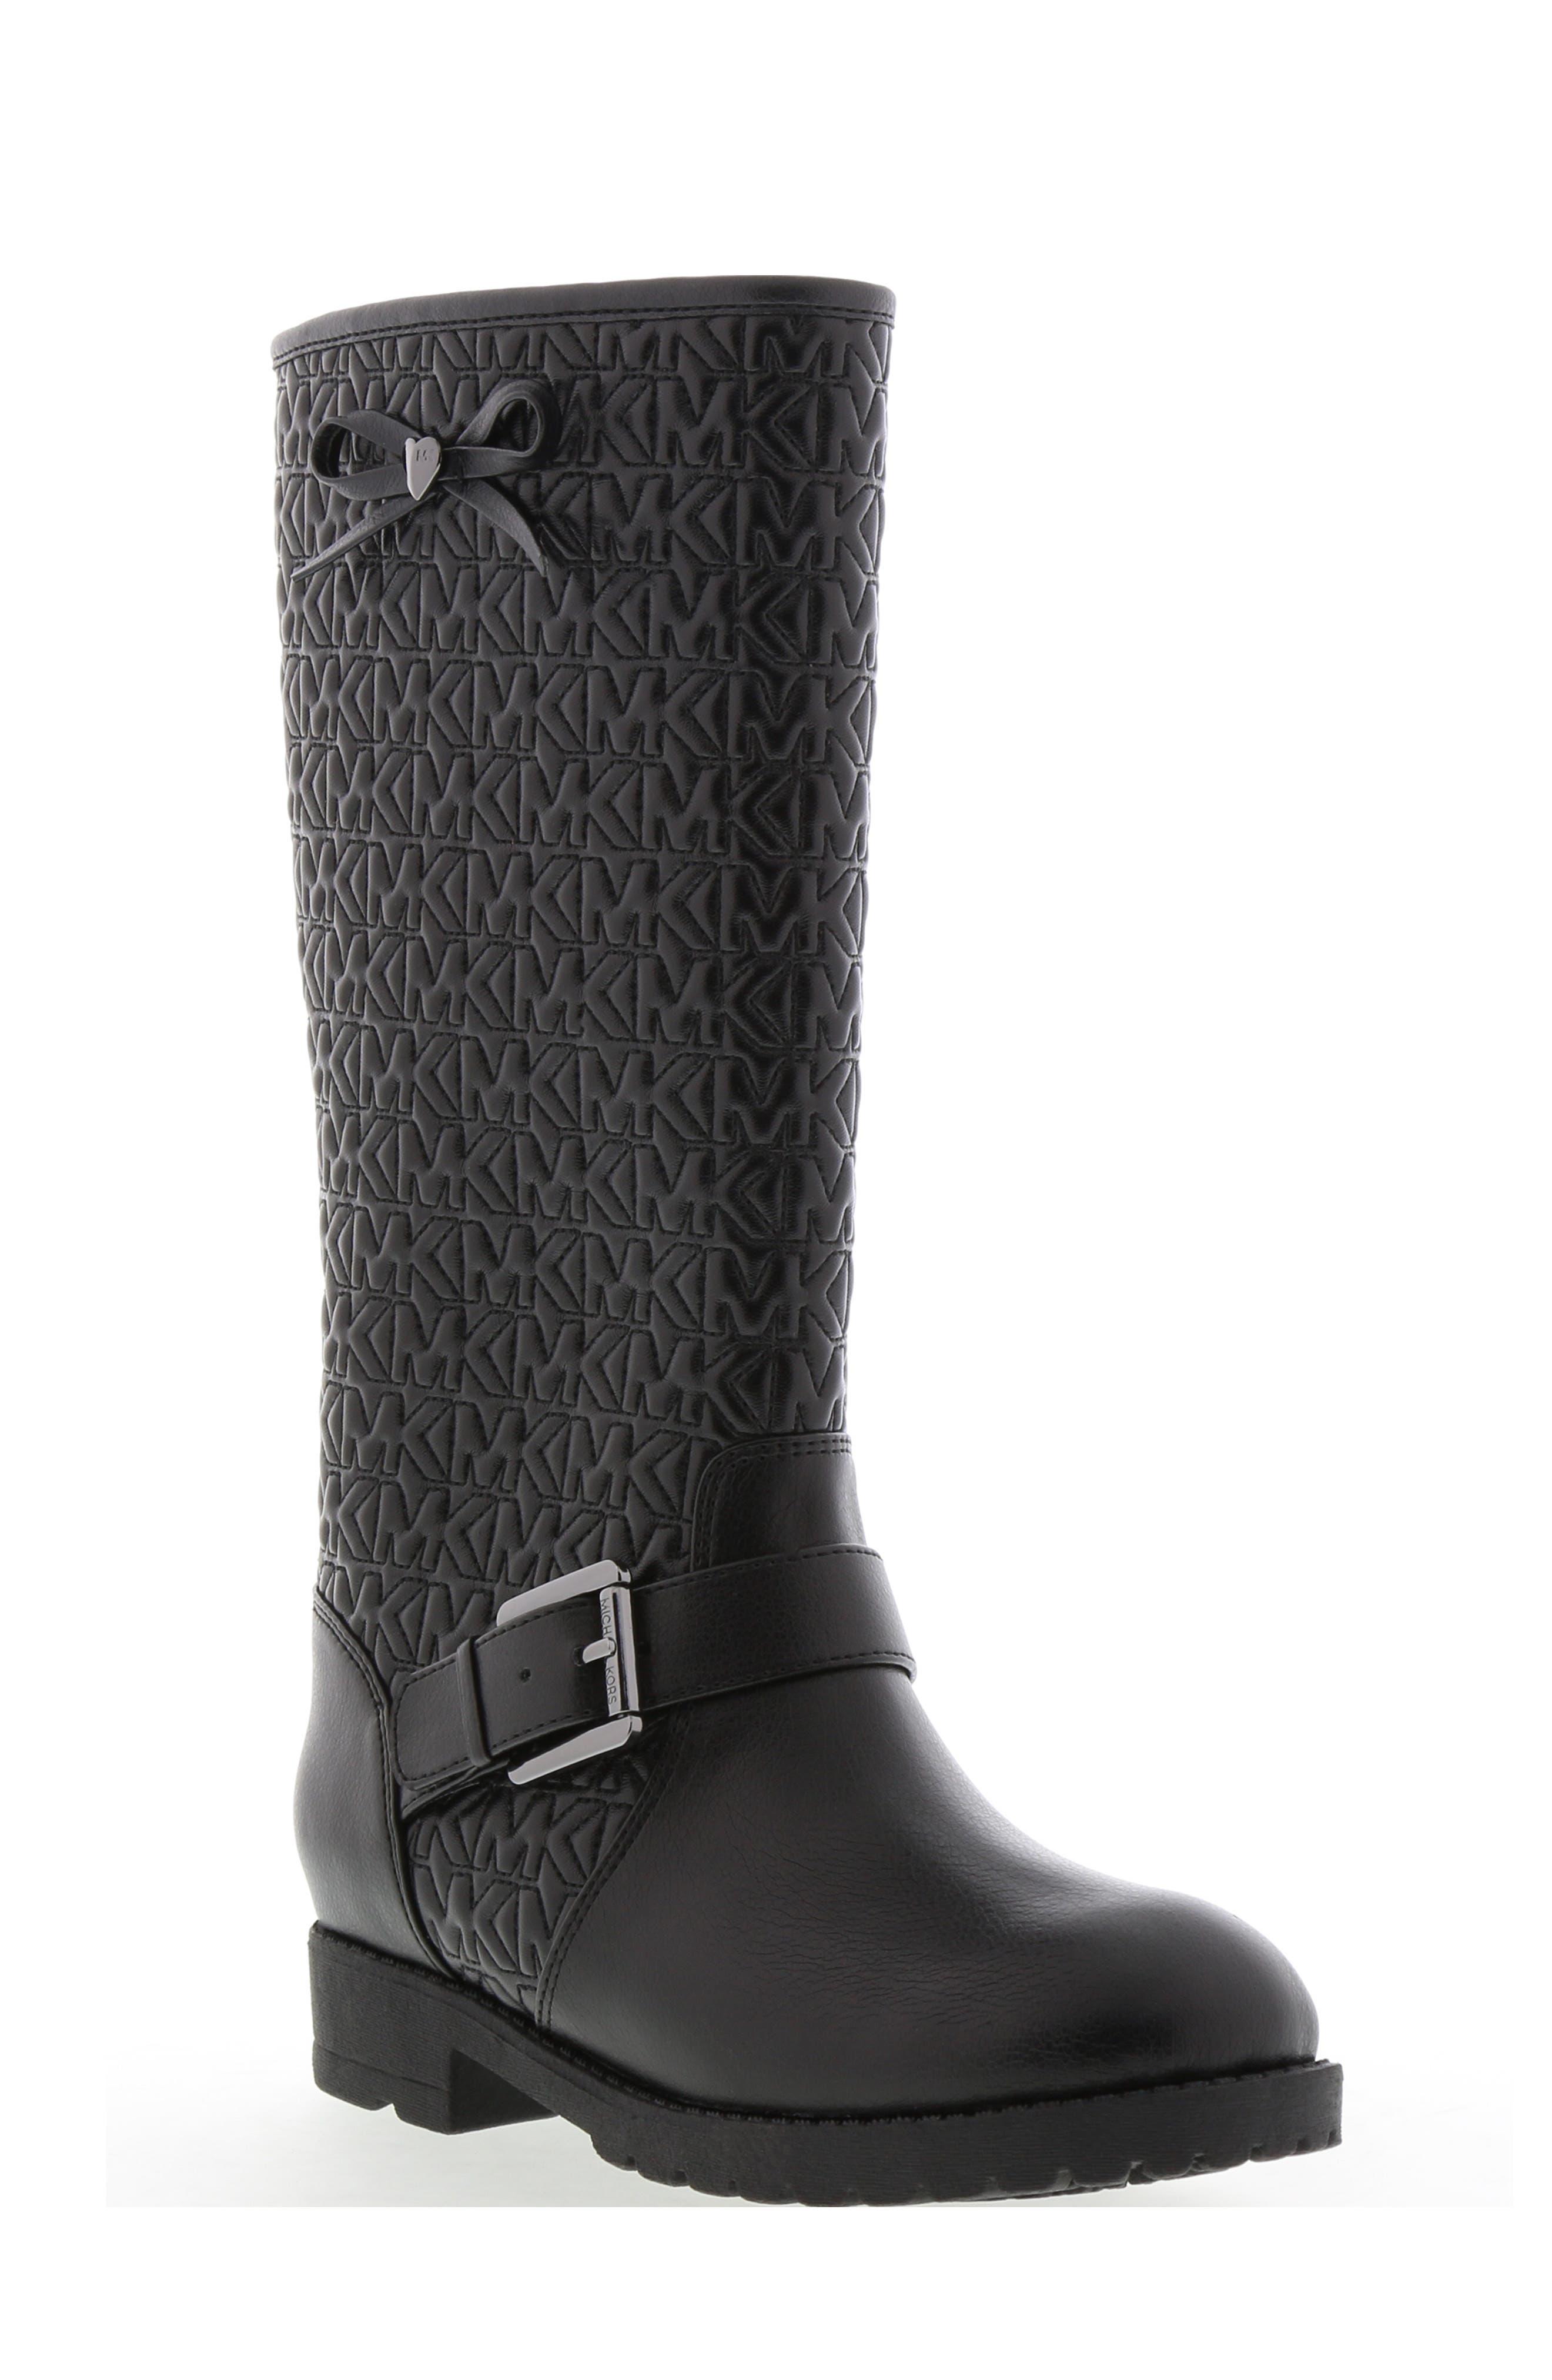 Toddler Girls Michael Michael Kors Dhalia Dearest Faux Leather Riding Boot Size 6 M  Black